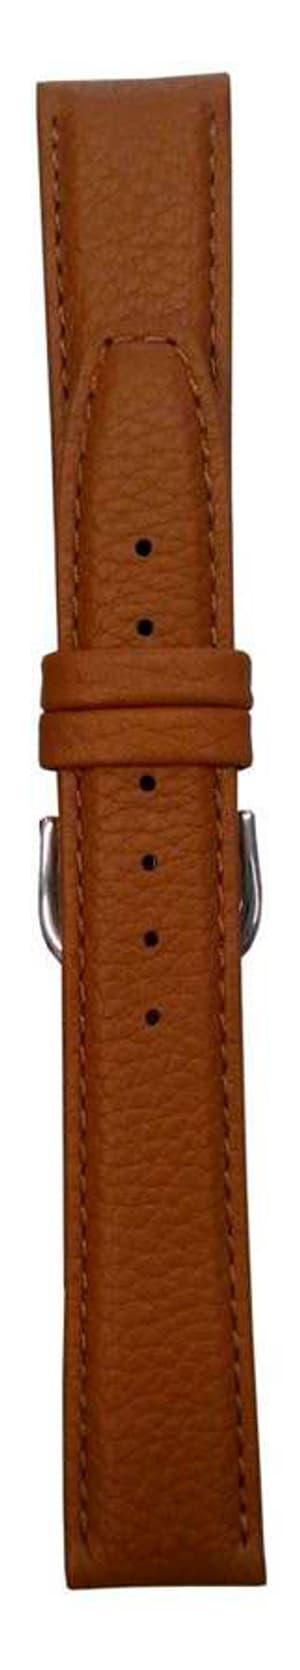 Bracelet de montre PIG PADDED marron 16mm